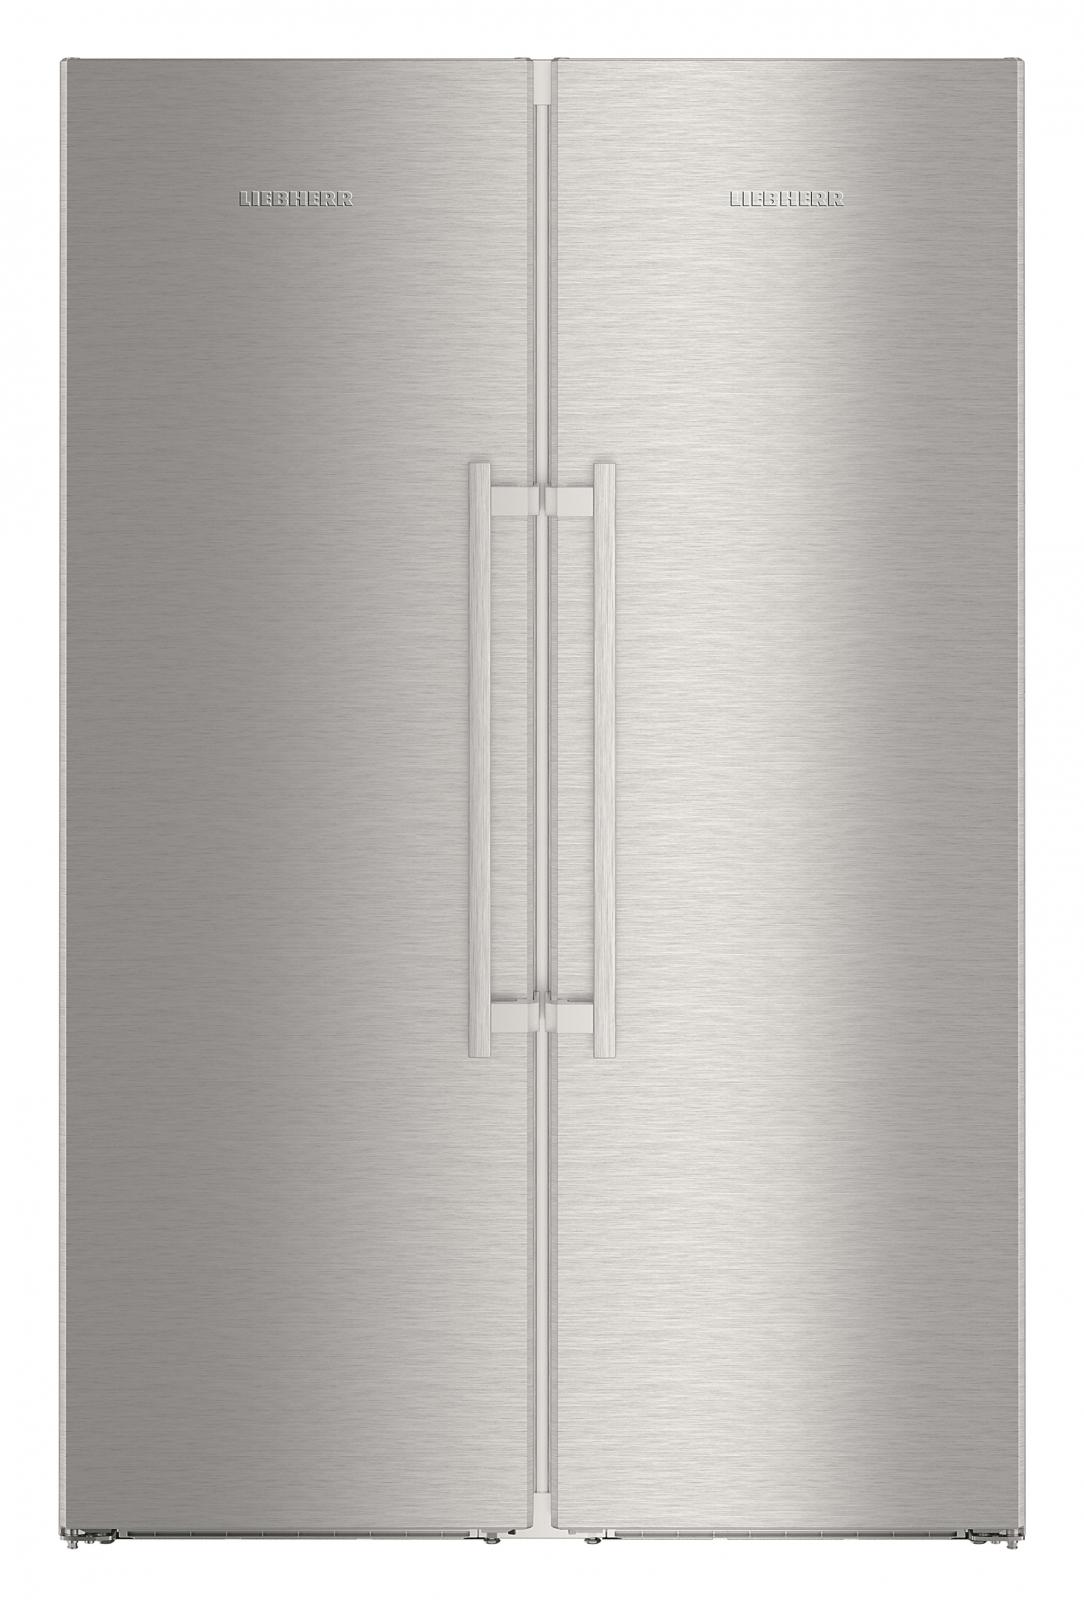 купить Side-by-Side холодильник Liebherr SBSes 8663 Украина фото 1